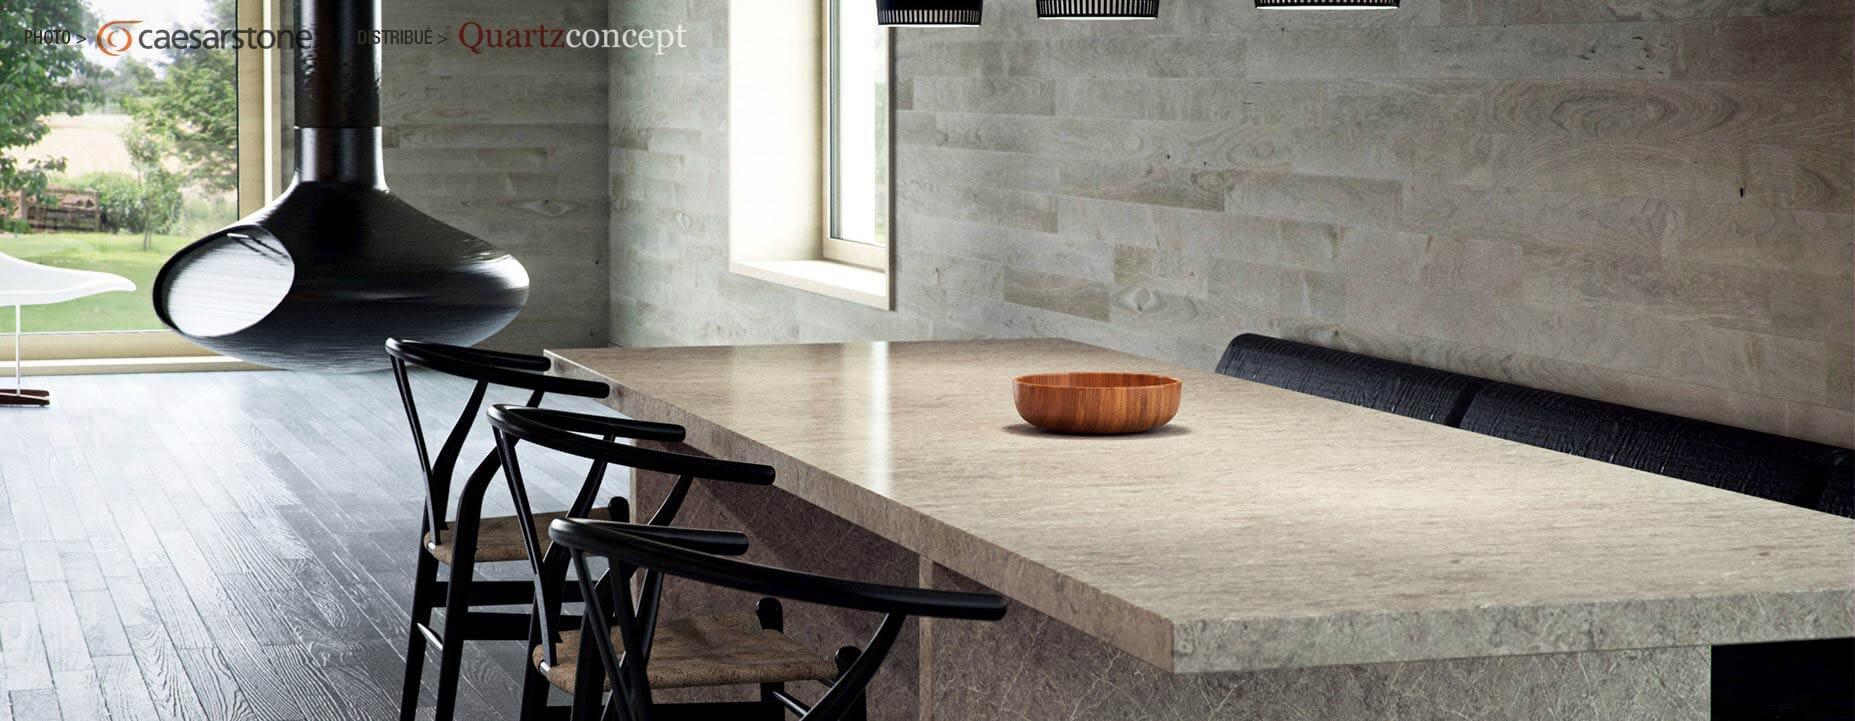 Quartz Caesarstone couleur 5133 symphony grey